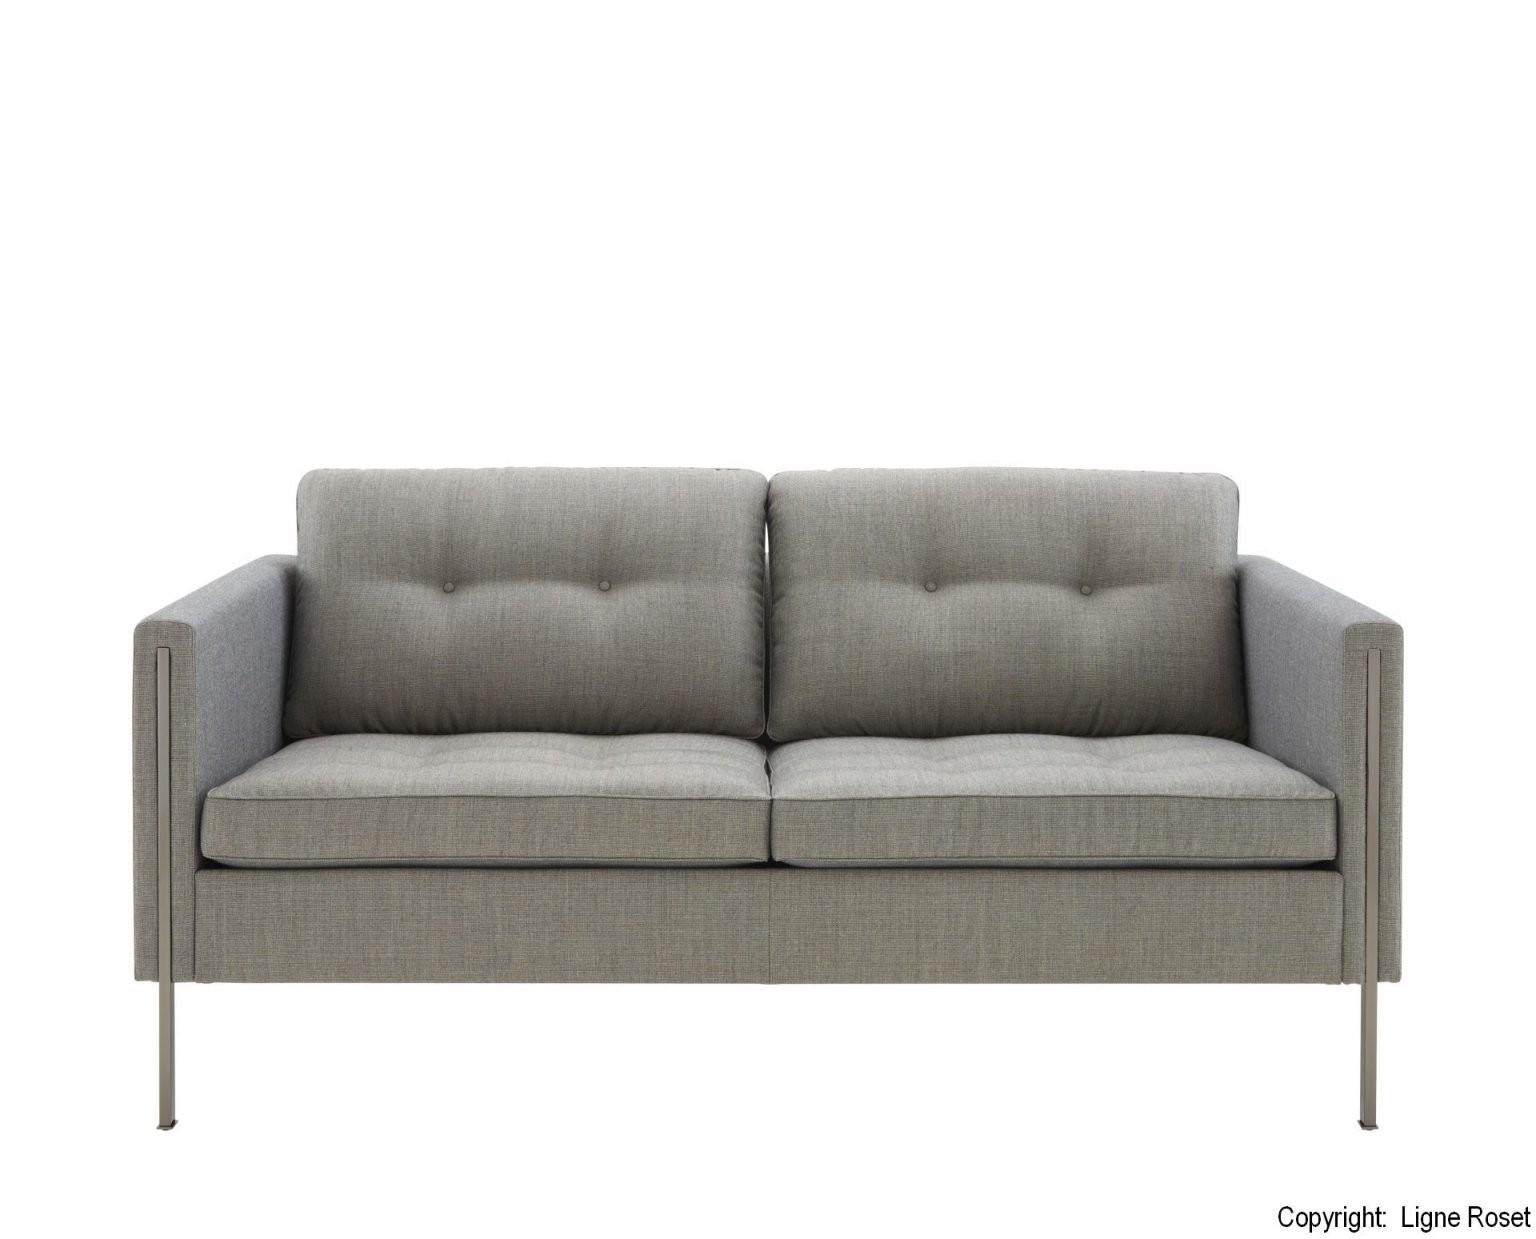 Graues Sofa  Welche Kissen Teppich Wandfarbe  Ahoi 7 von Graues Sofa Welche Wandfarbe Photo